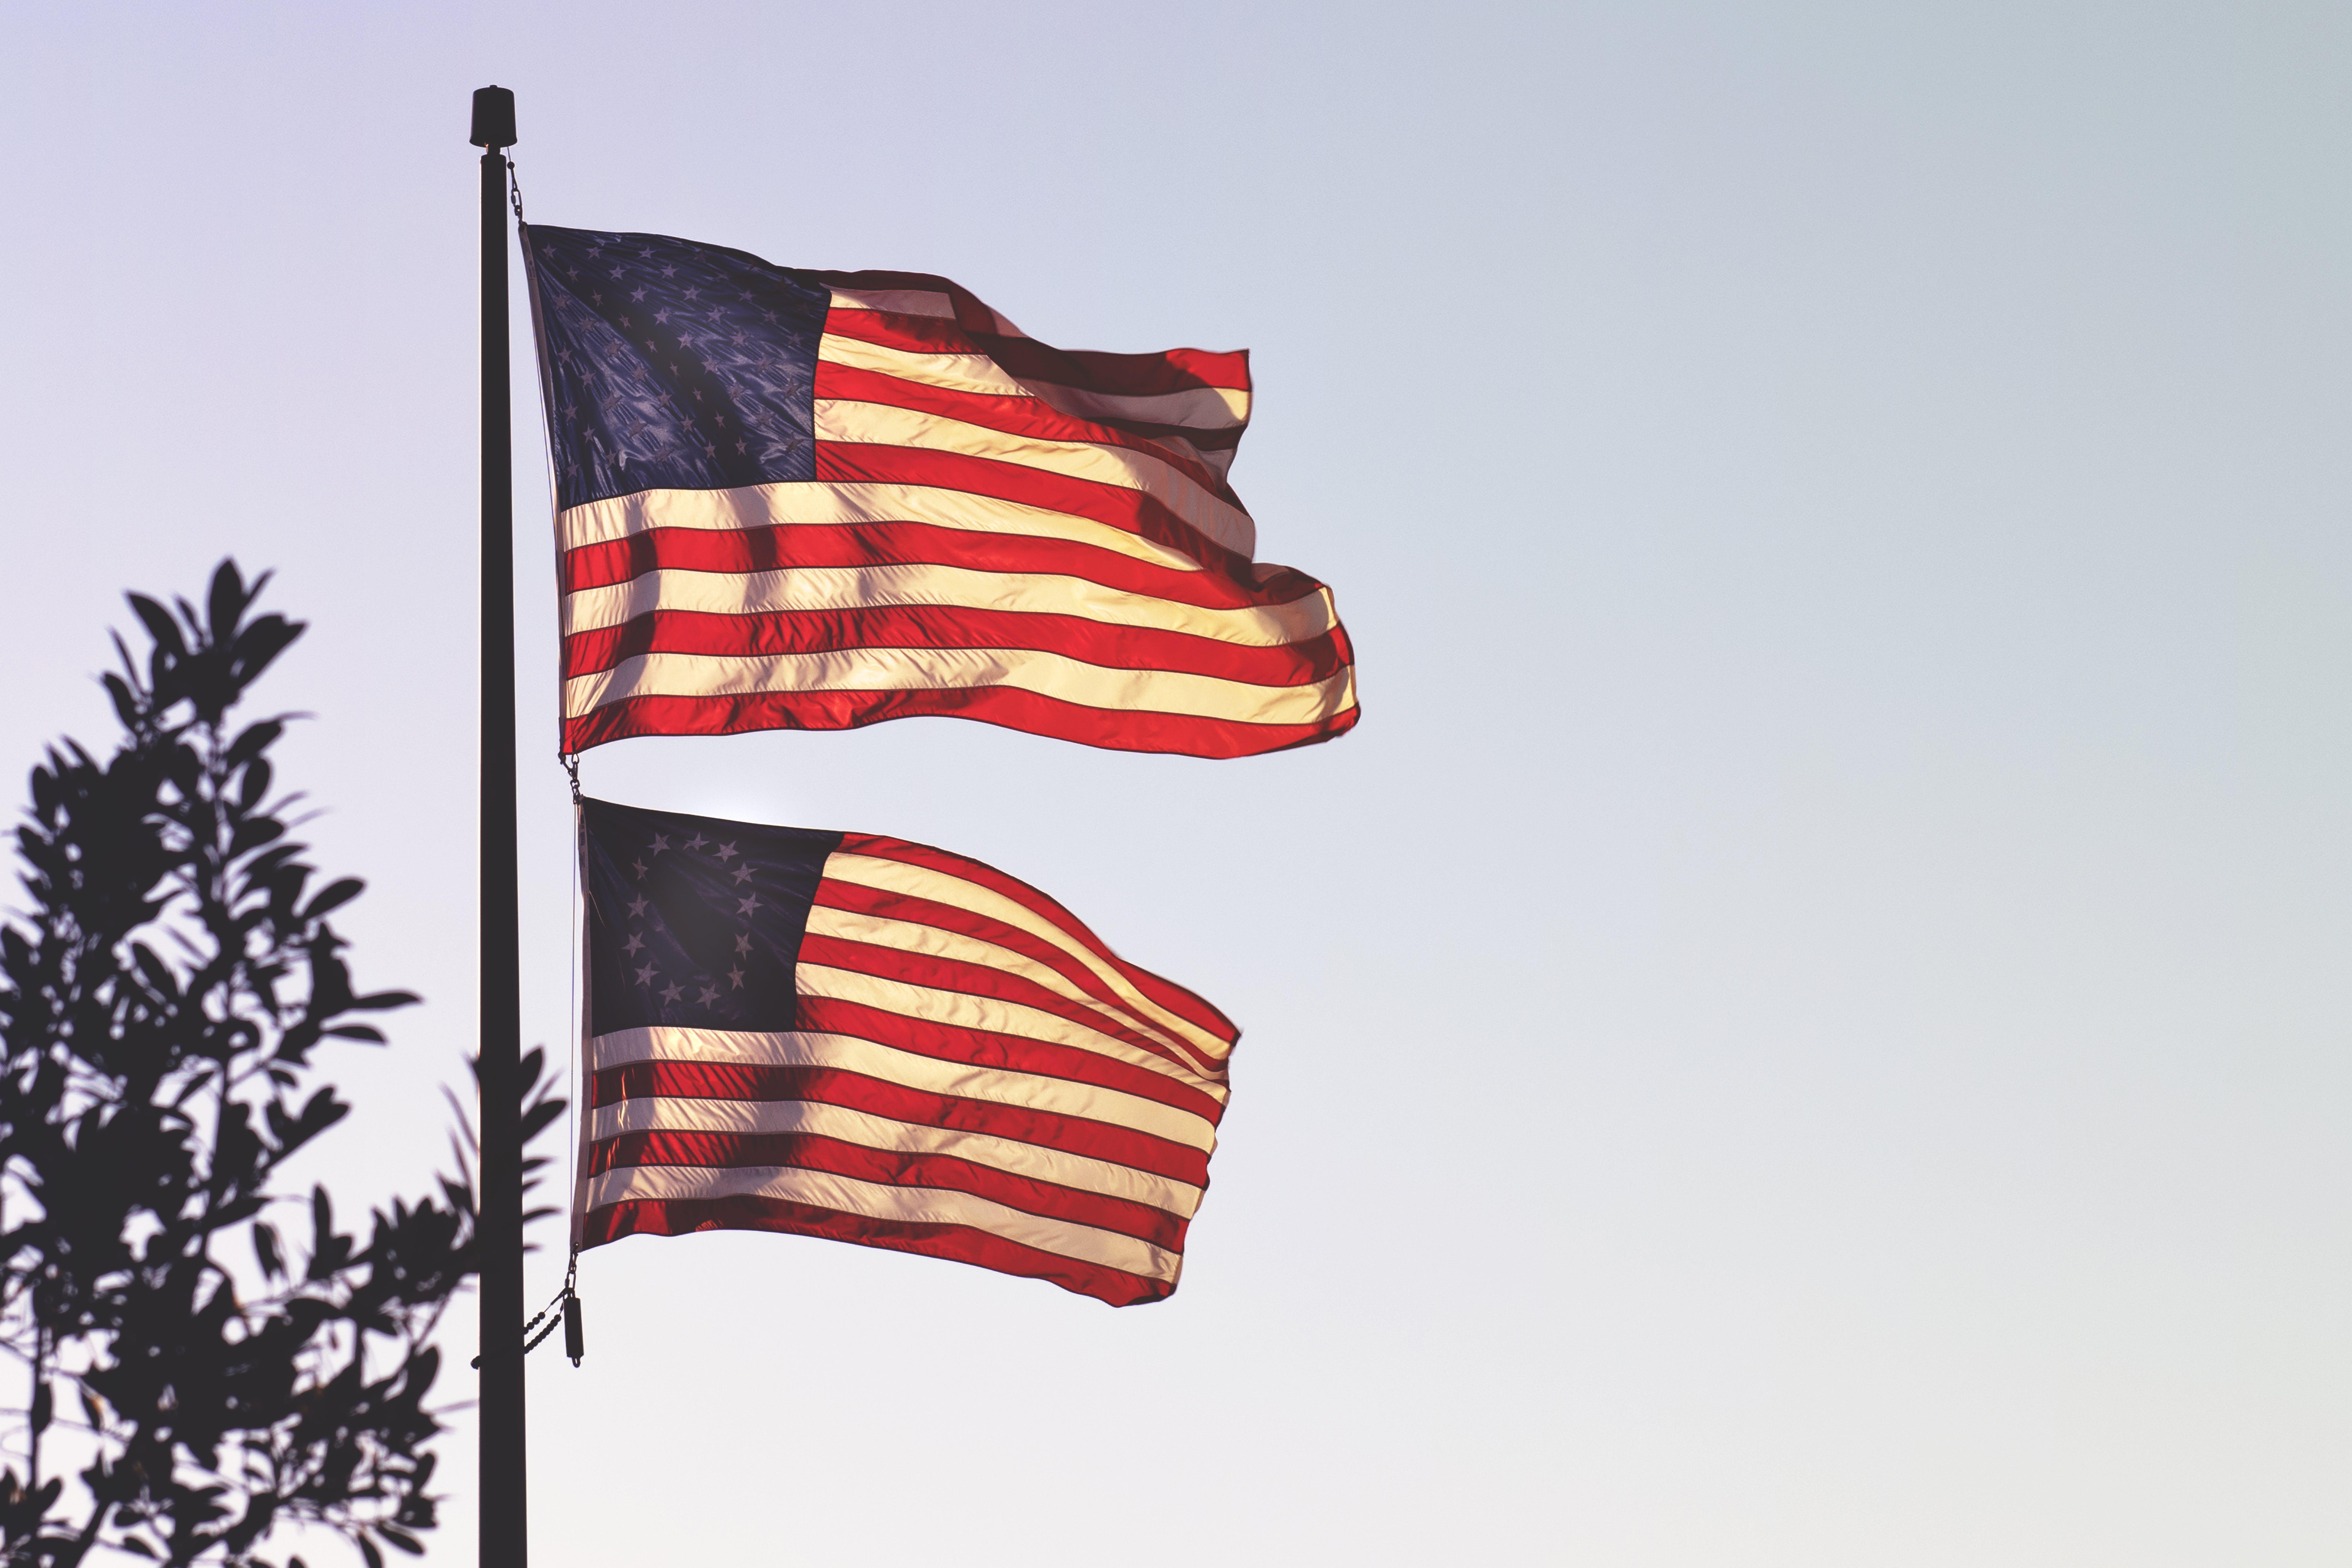 amerika, amerikanische flagge, amerikanische flaggen